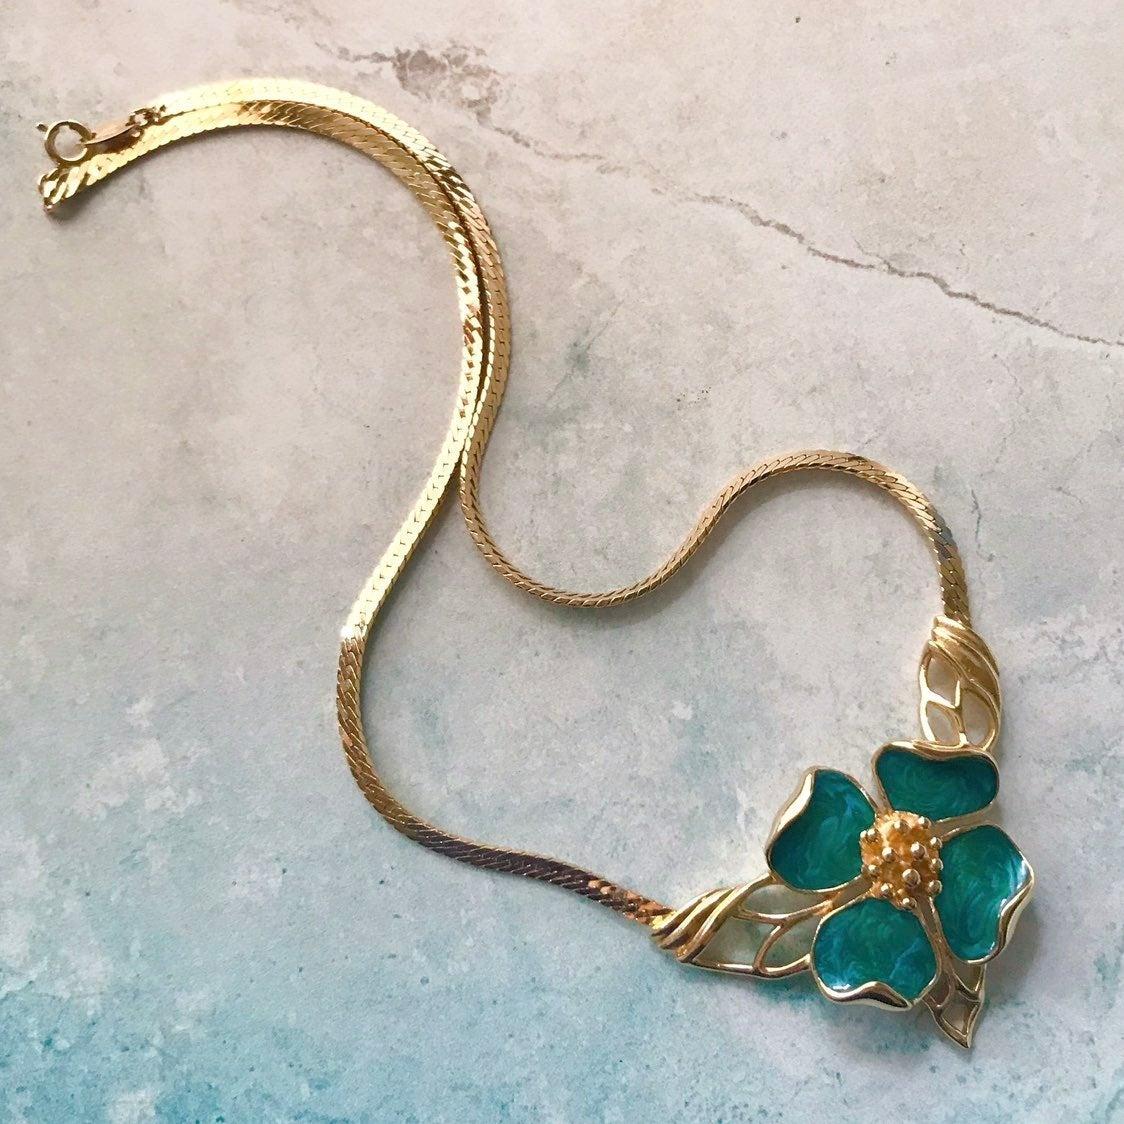 Trifari Green Dogwood Necklace